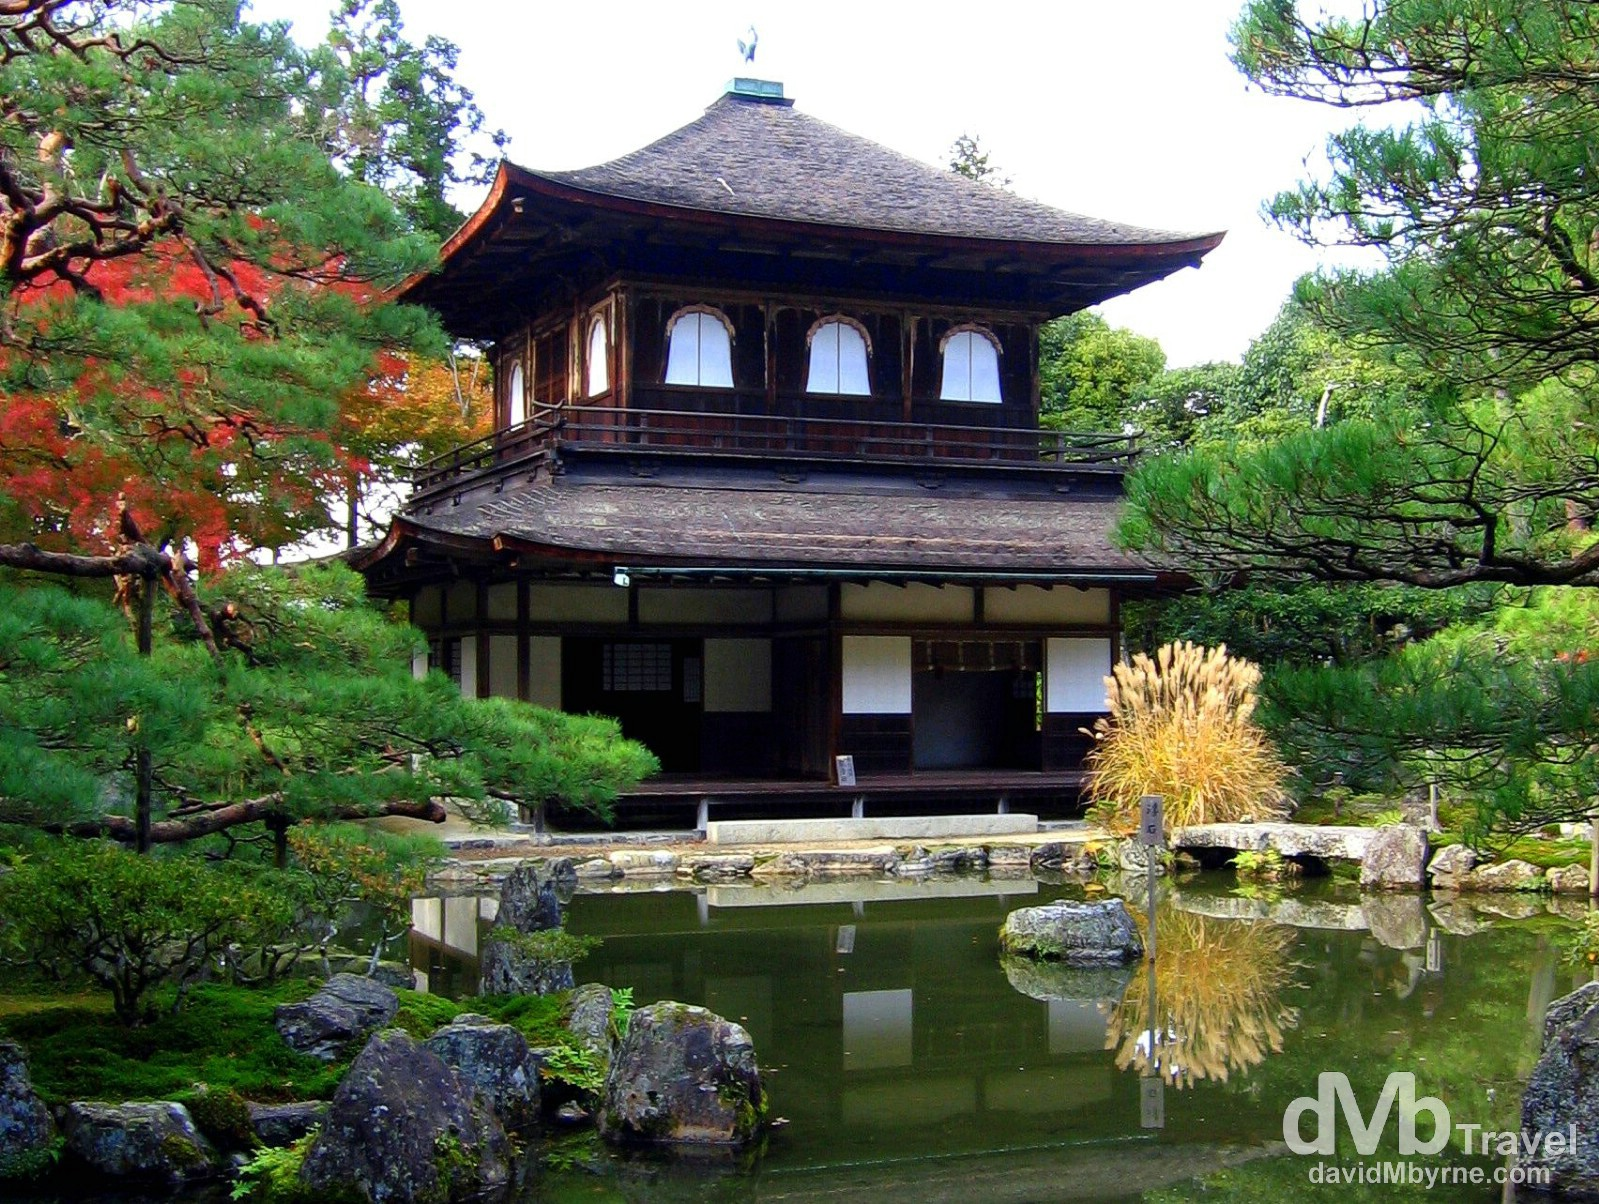 The Silver Pavilion, Ginkaku-ji Temple, Higashiyama-ku, Kyoto, Japan. November 20th, 2007.